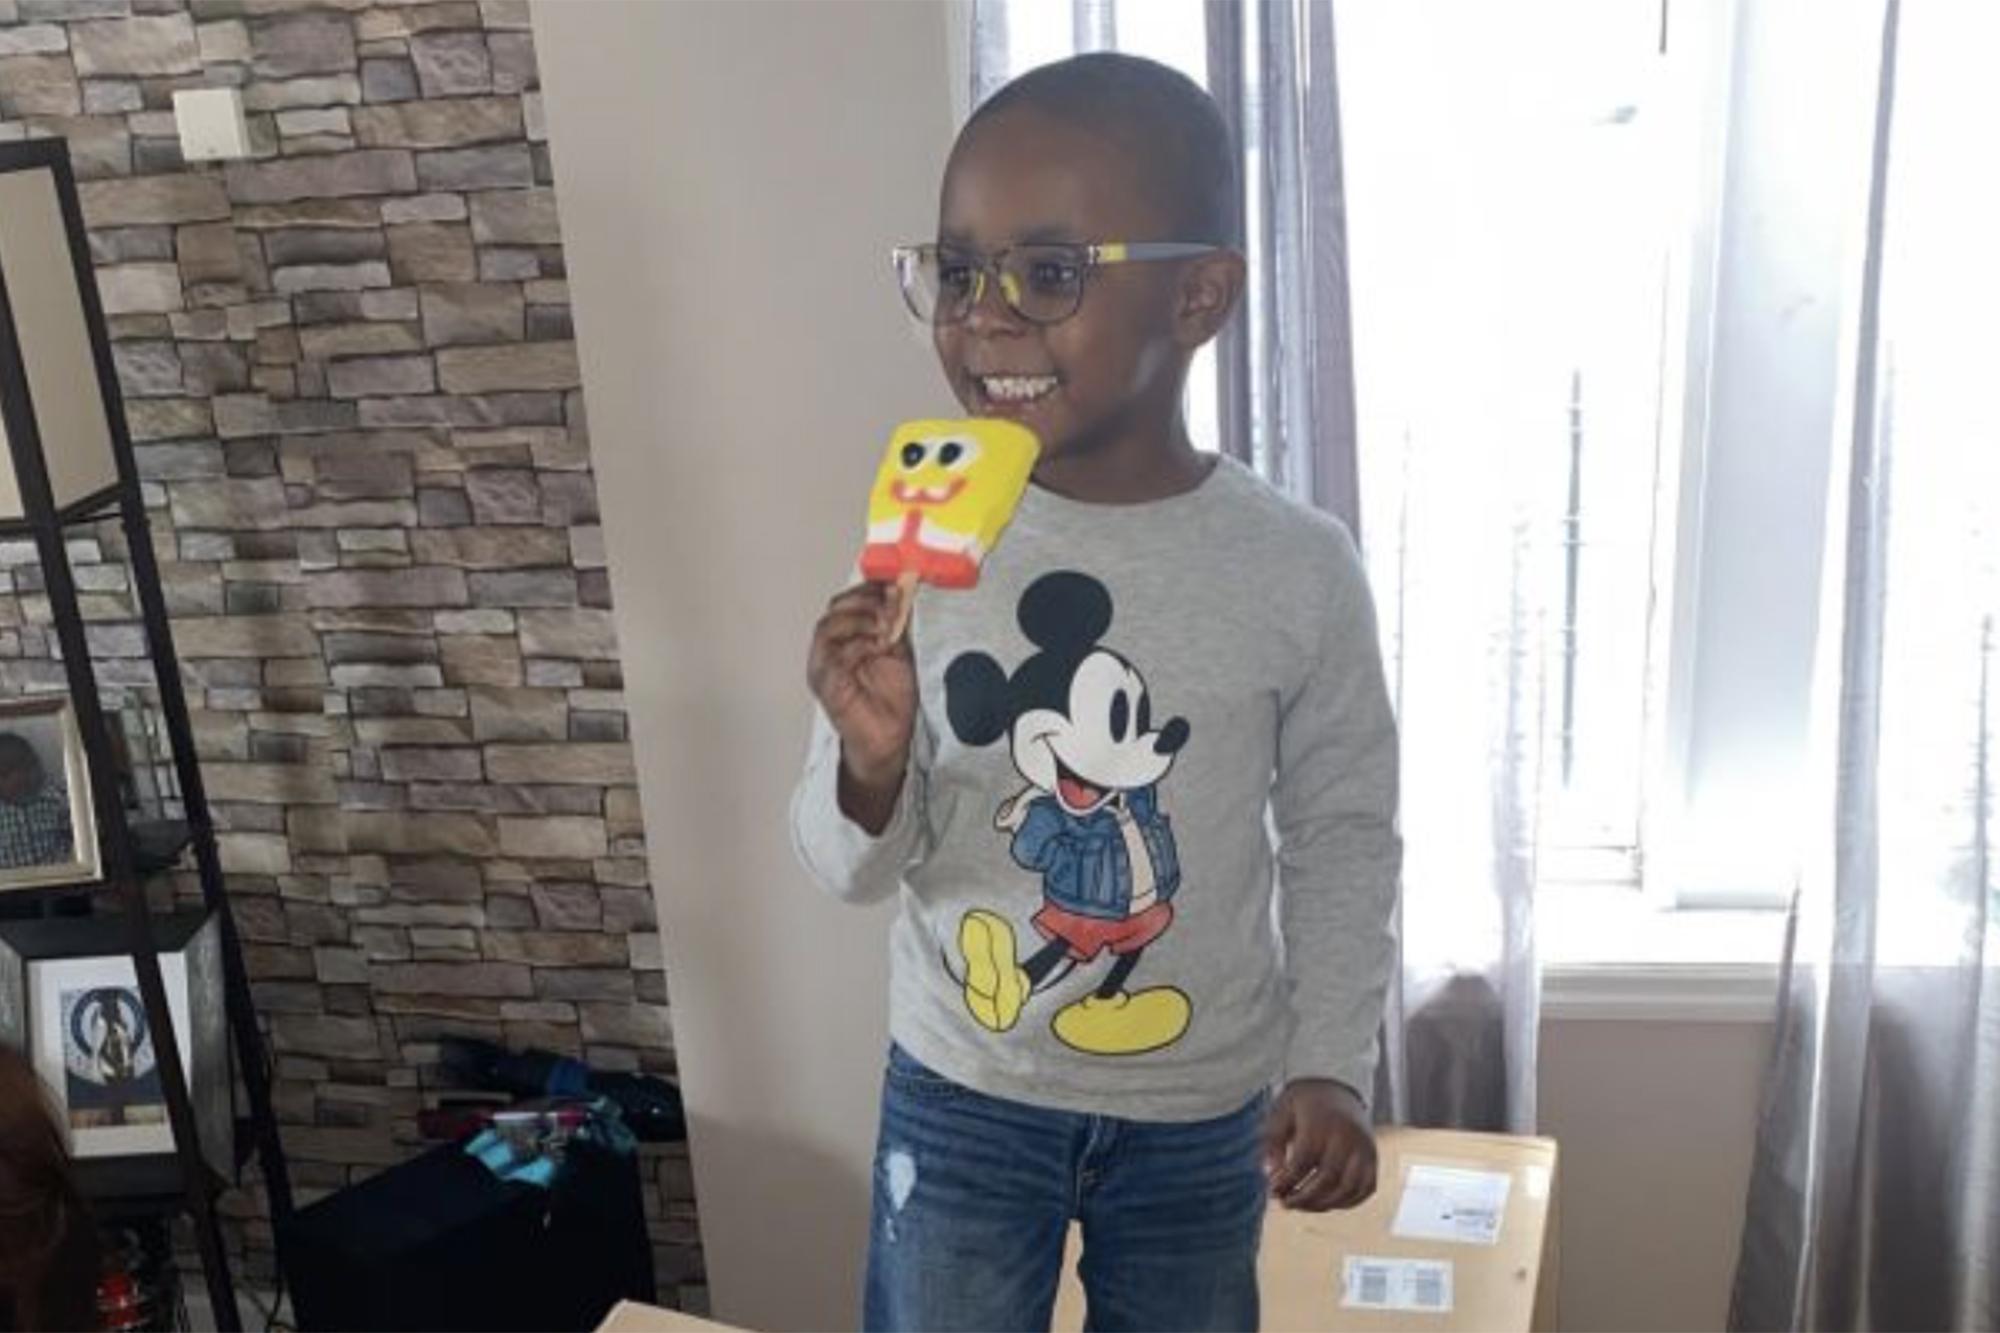 Boy's botched Amazon order leaves him with $2,620 worth of Spongebob  Squarepants popsicles